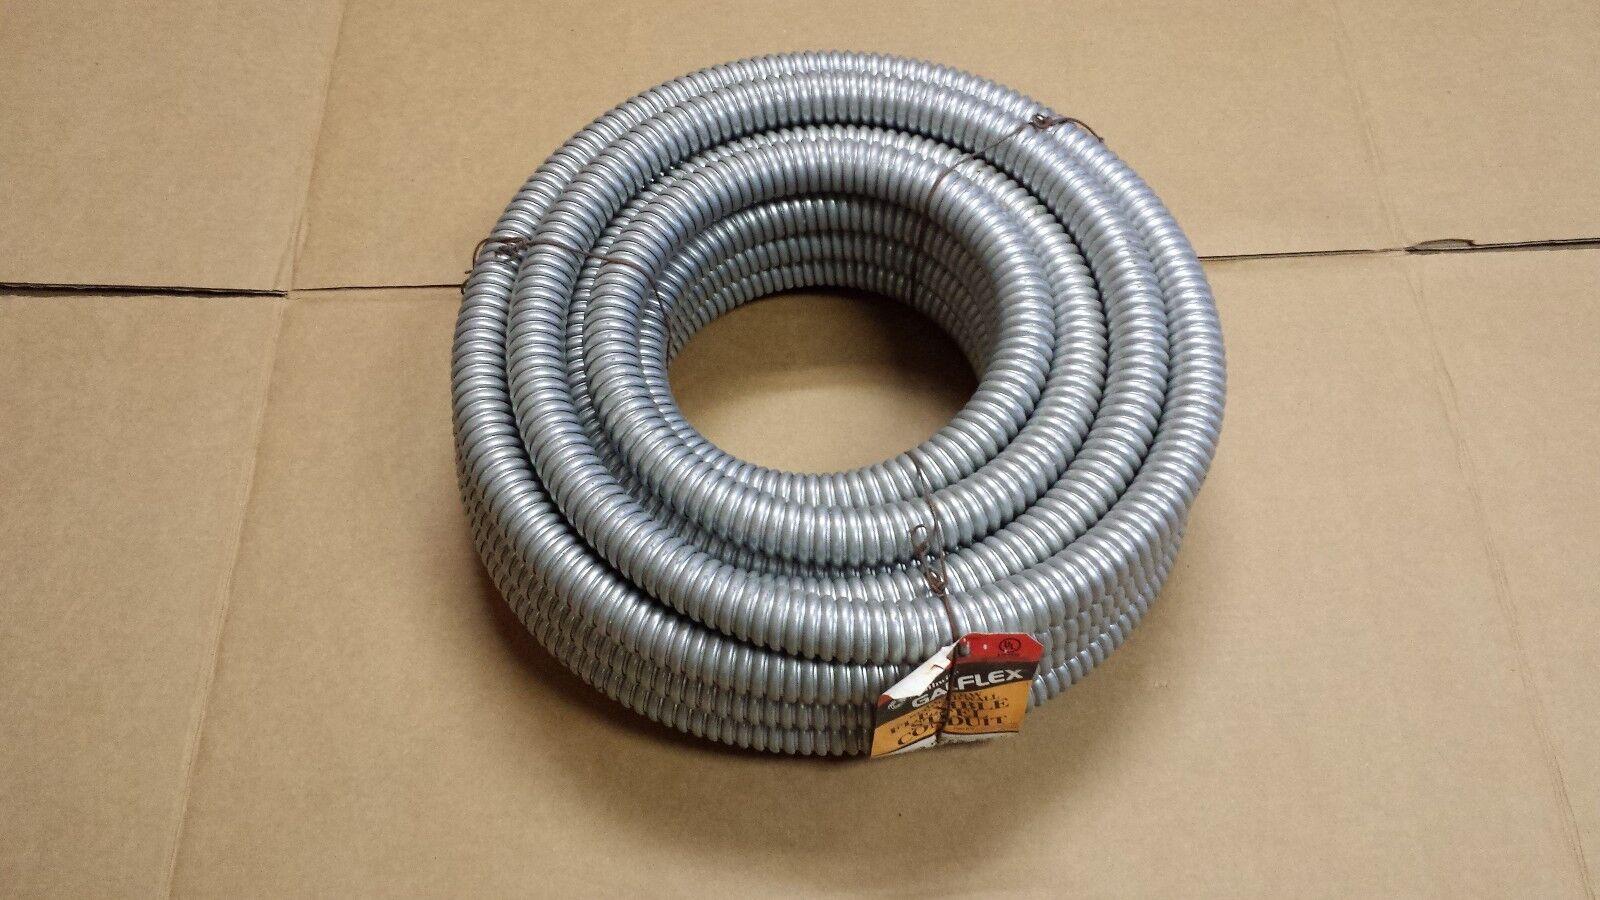 Southwire 55091601 1 X 50\' Rws Flex Steel Conduit | eBay